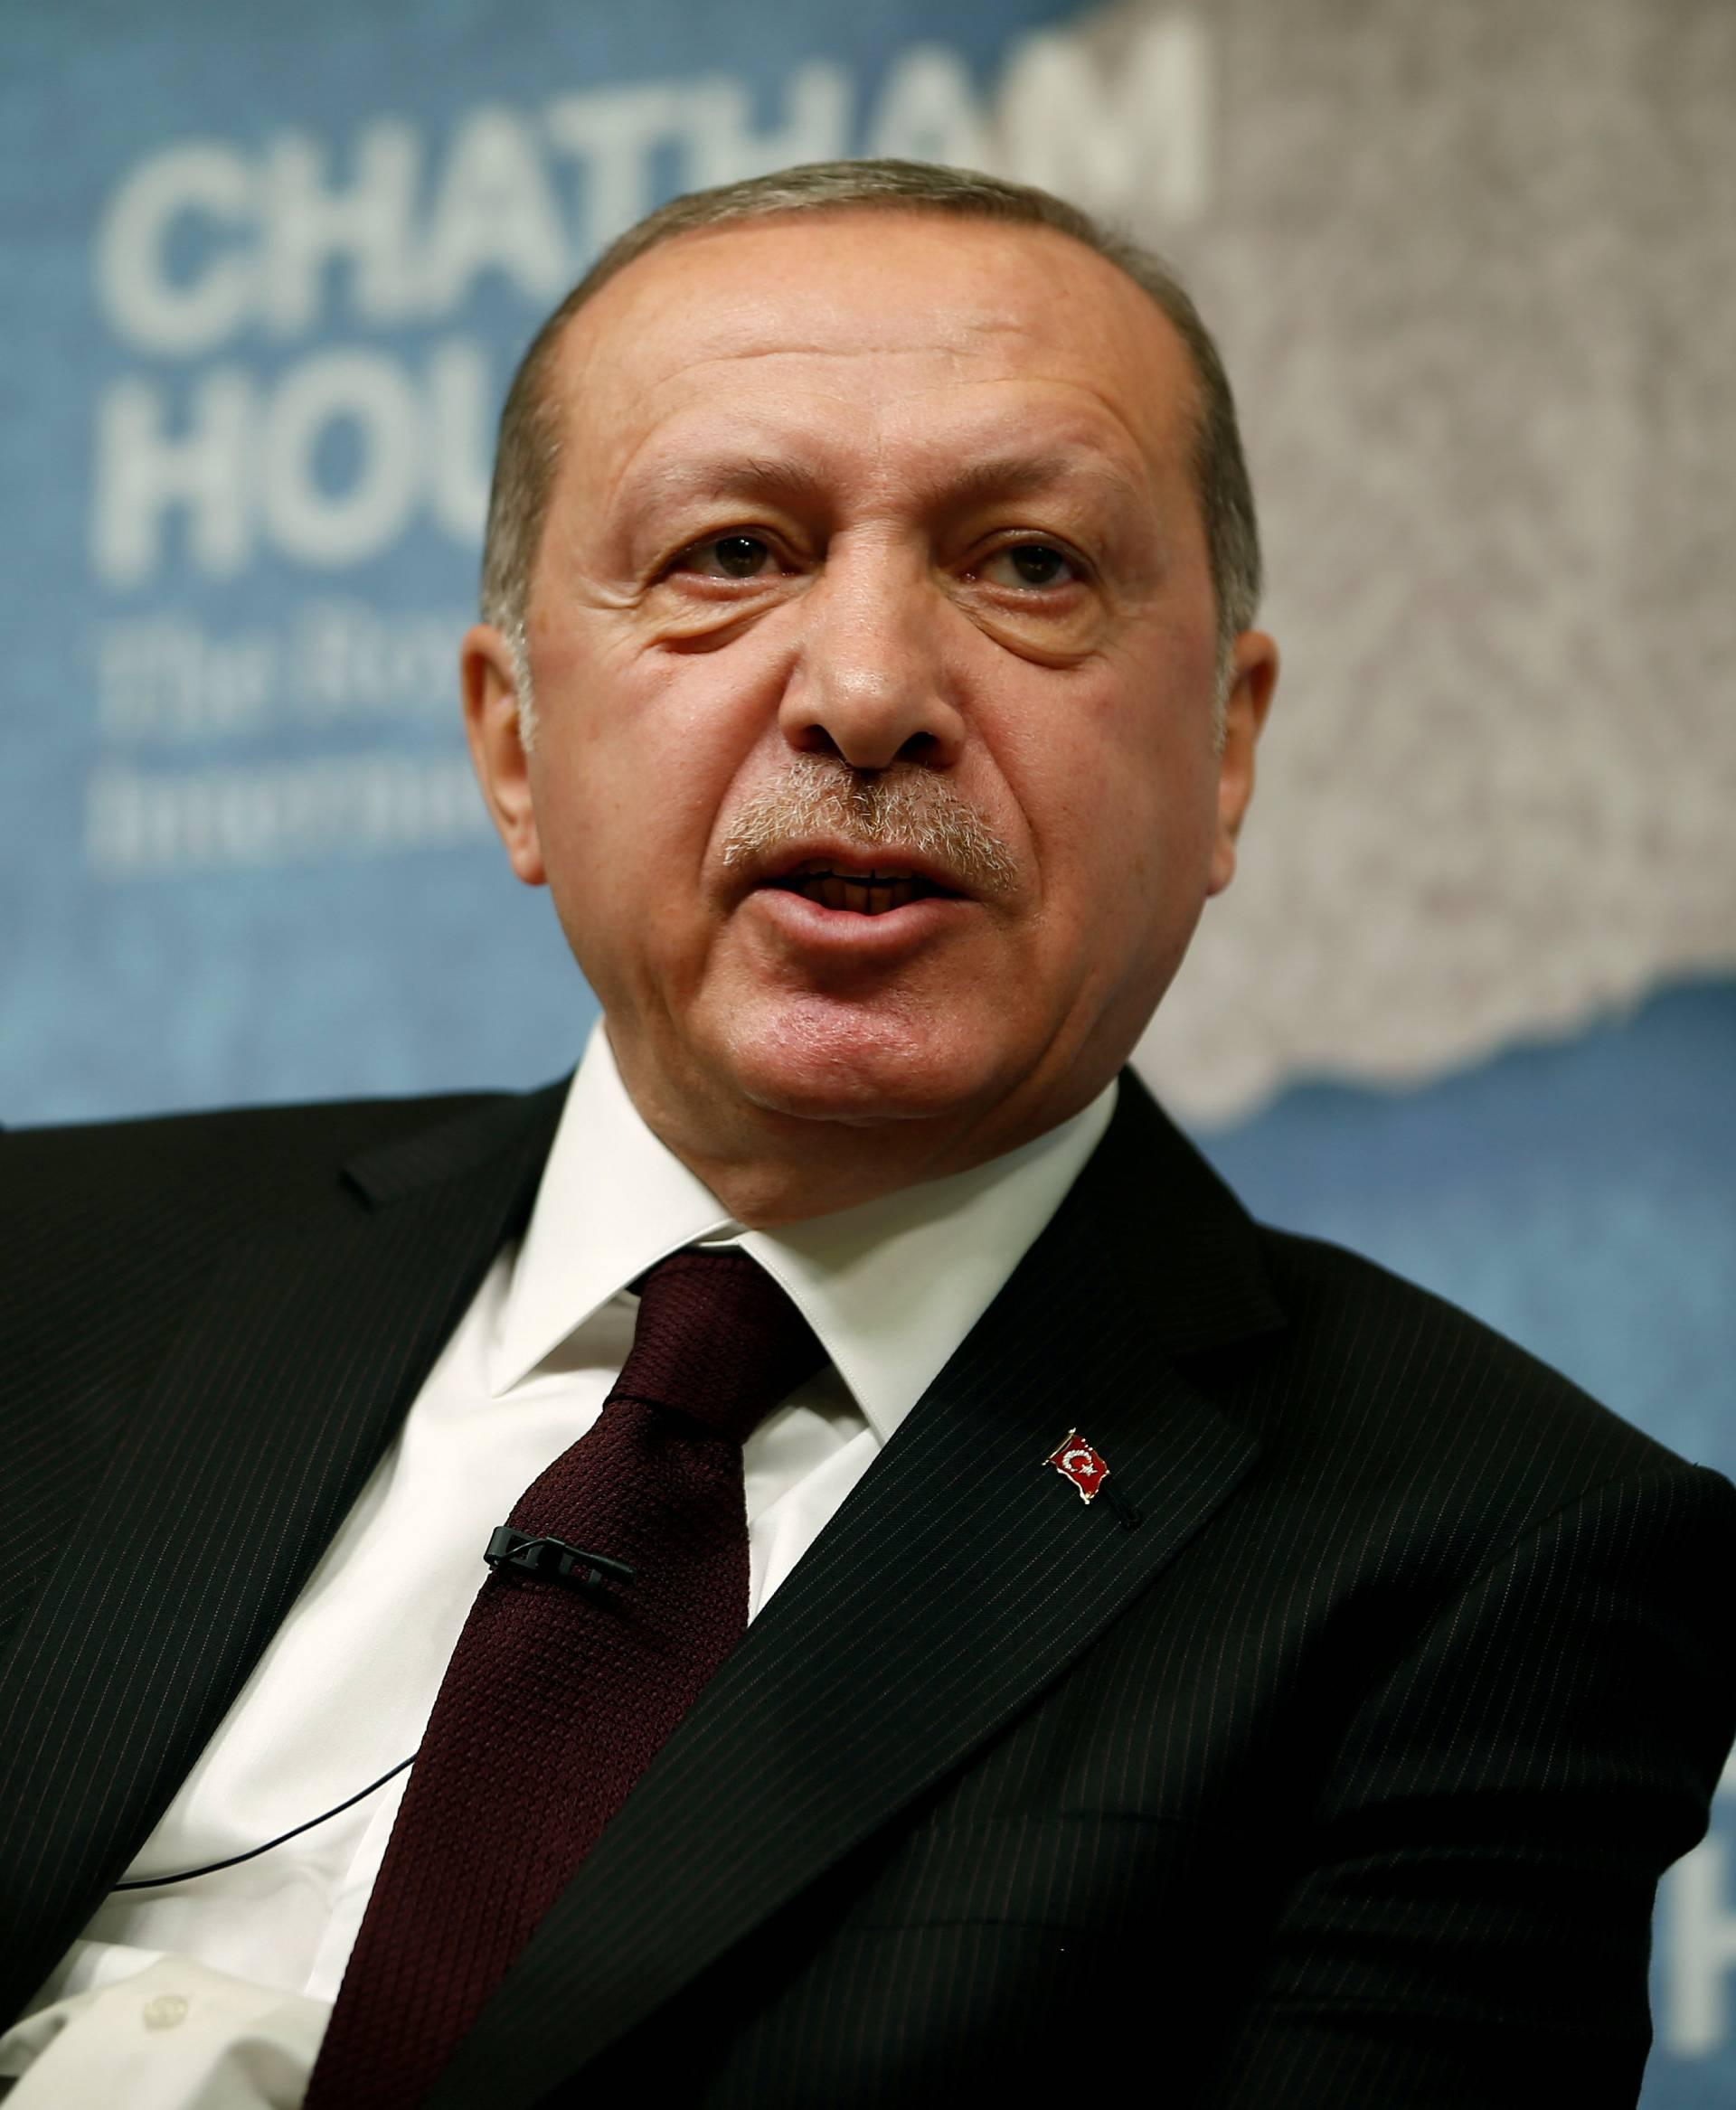 FILE PHOTO: The President of Turkey, Recep Tayyip Erdogan